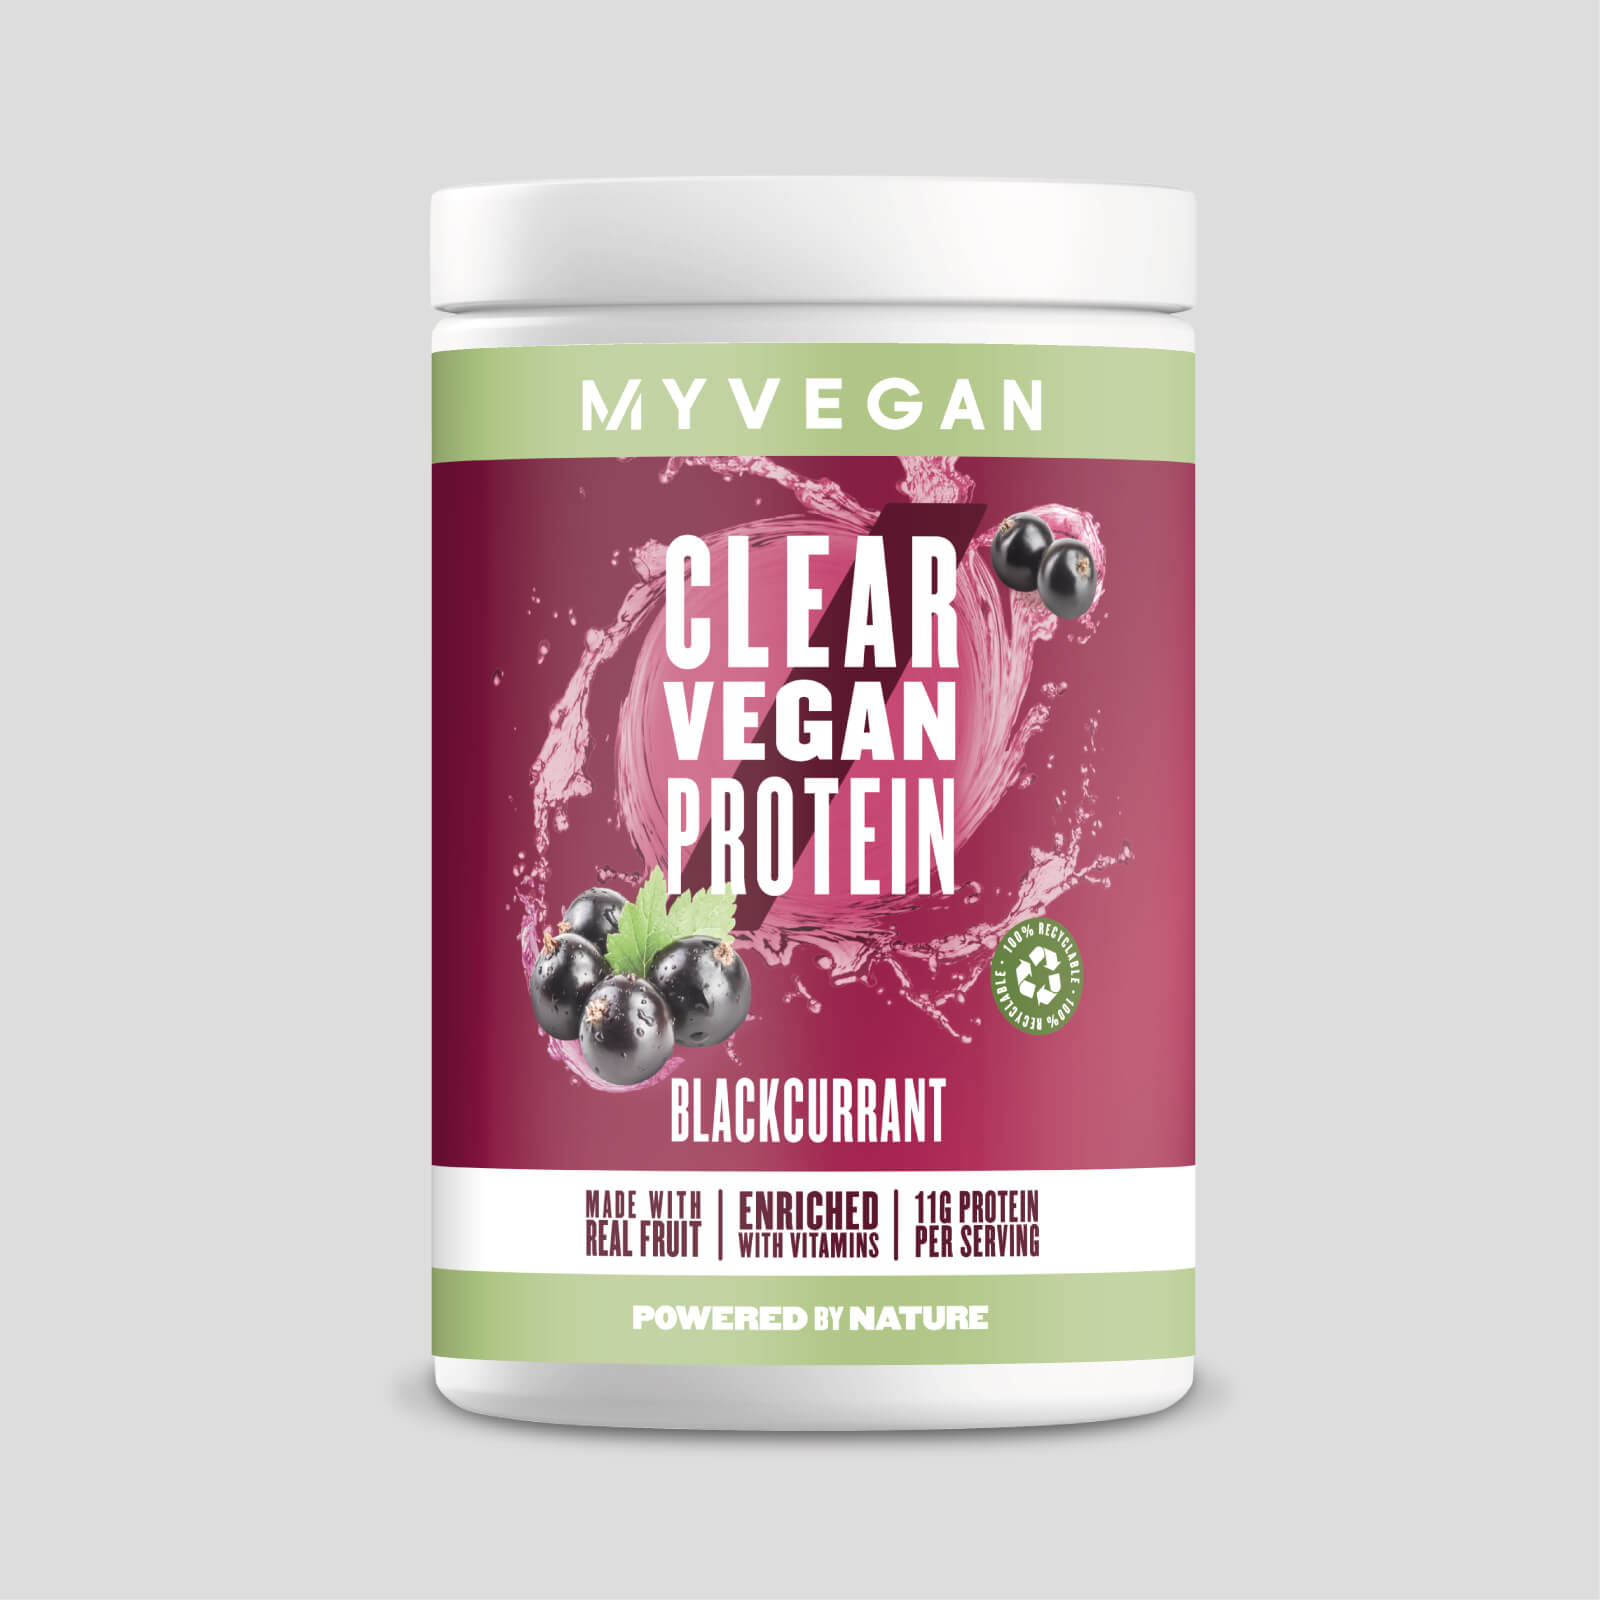 Clear Vegan Protein - Blackcurrant